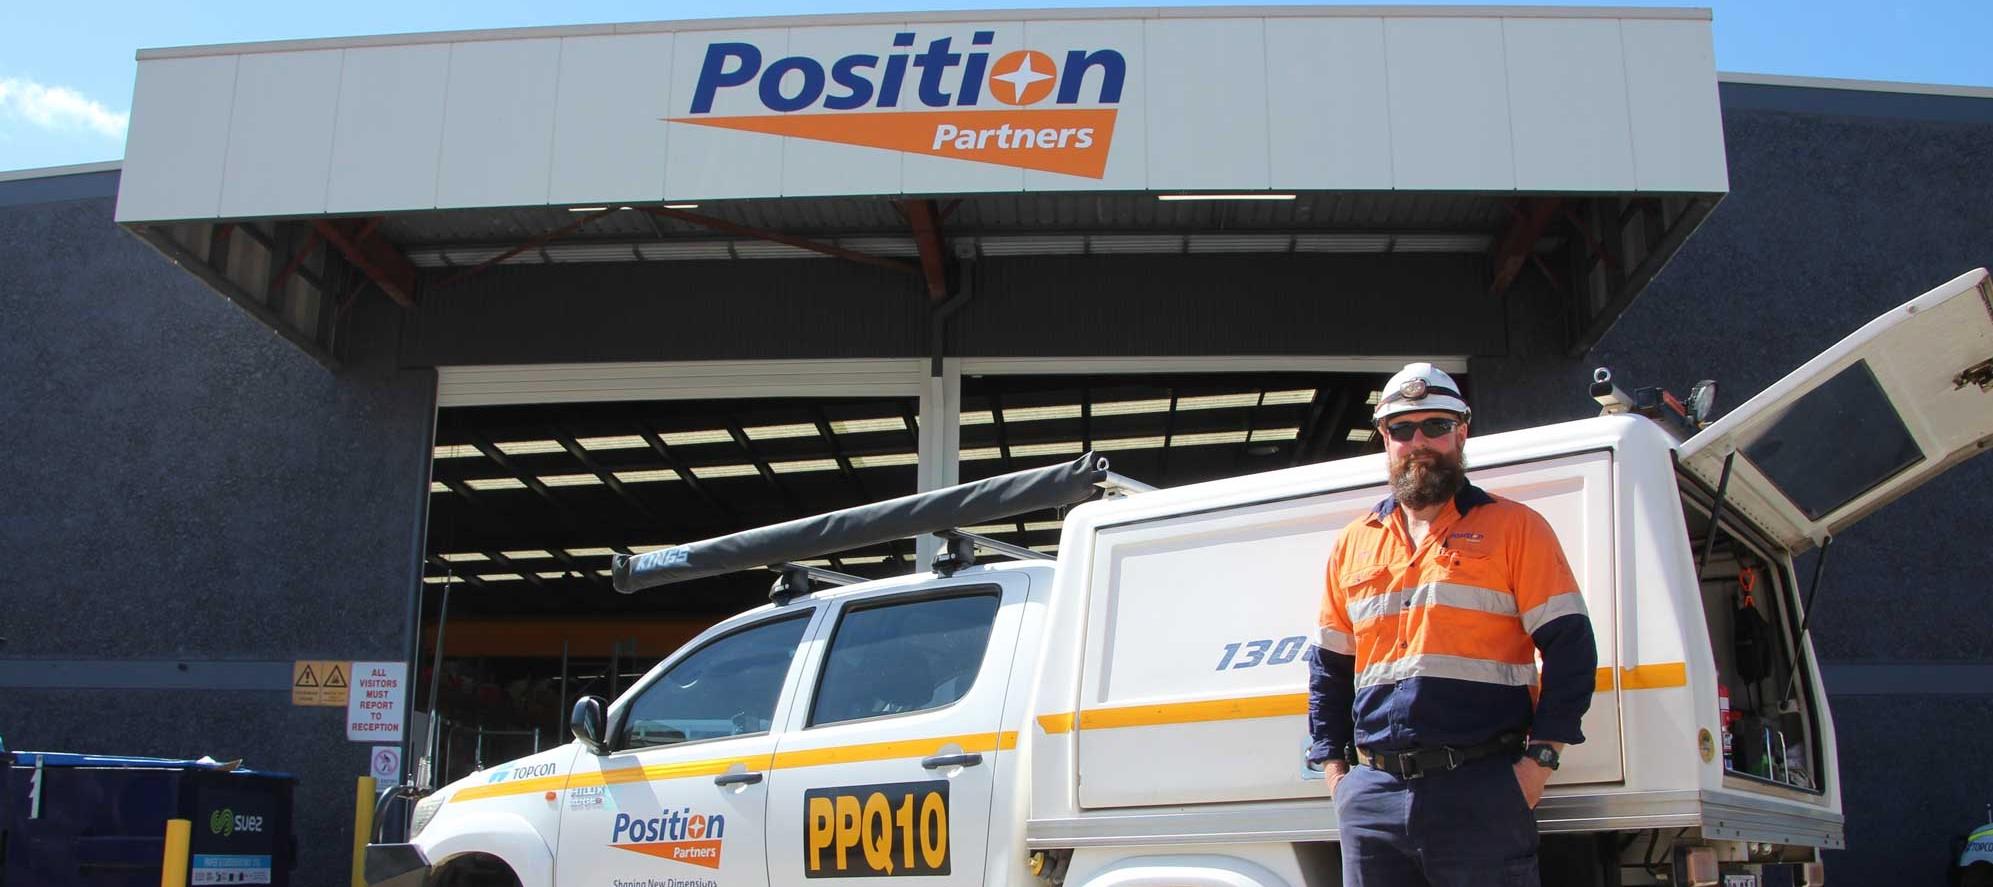 Fleet Management Systems | Position Partners